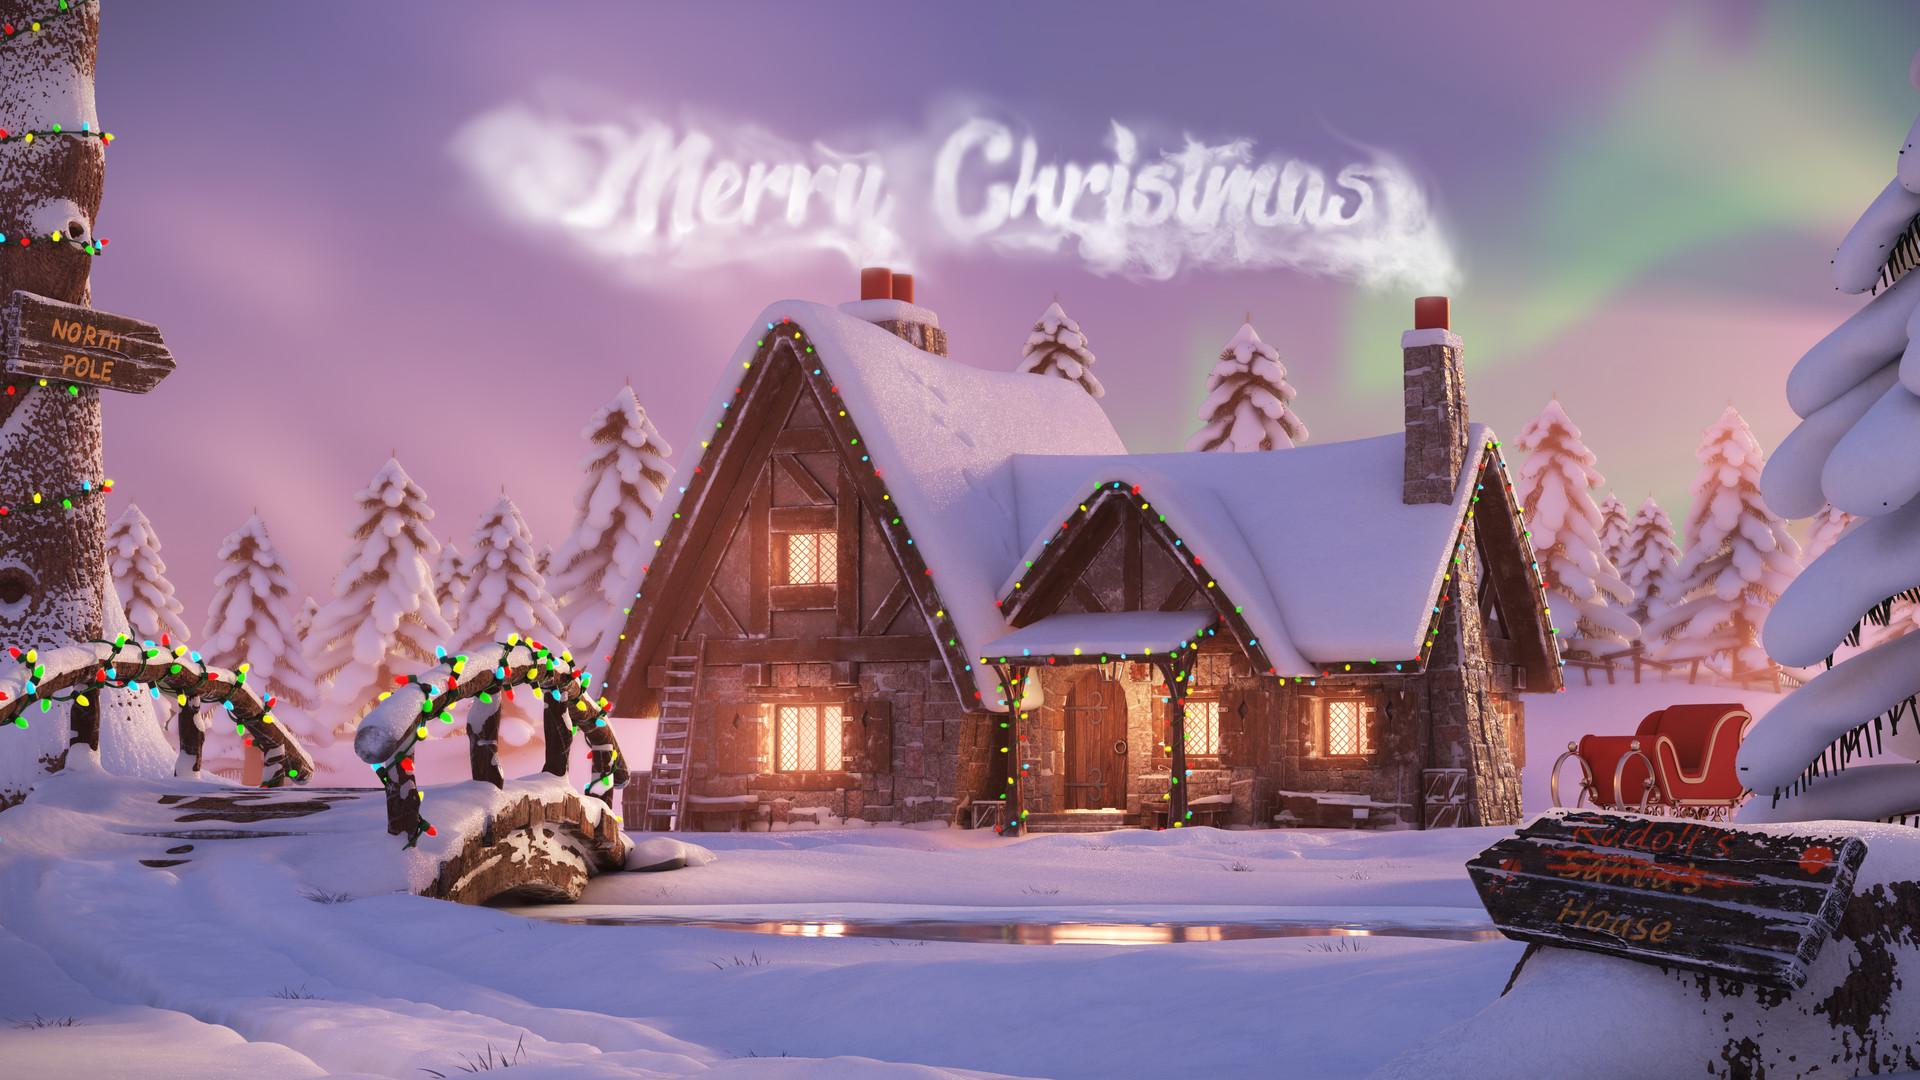 Darko mitev christmascard01